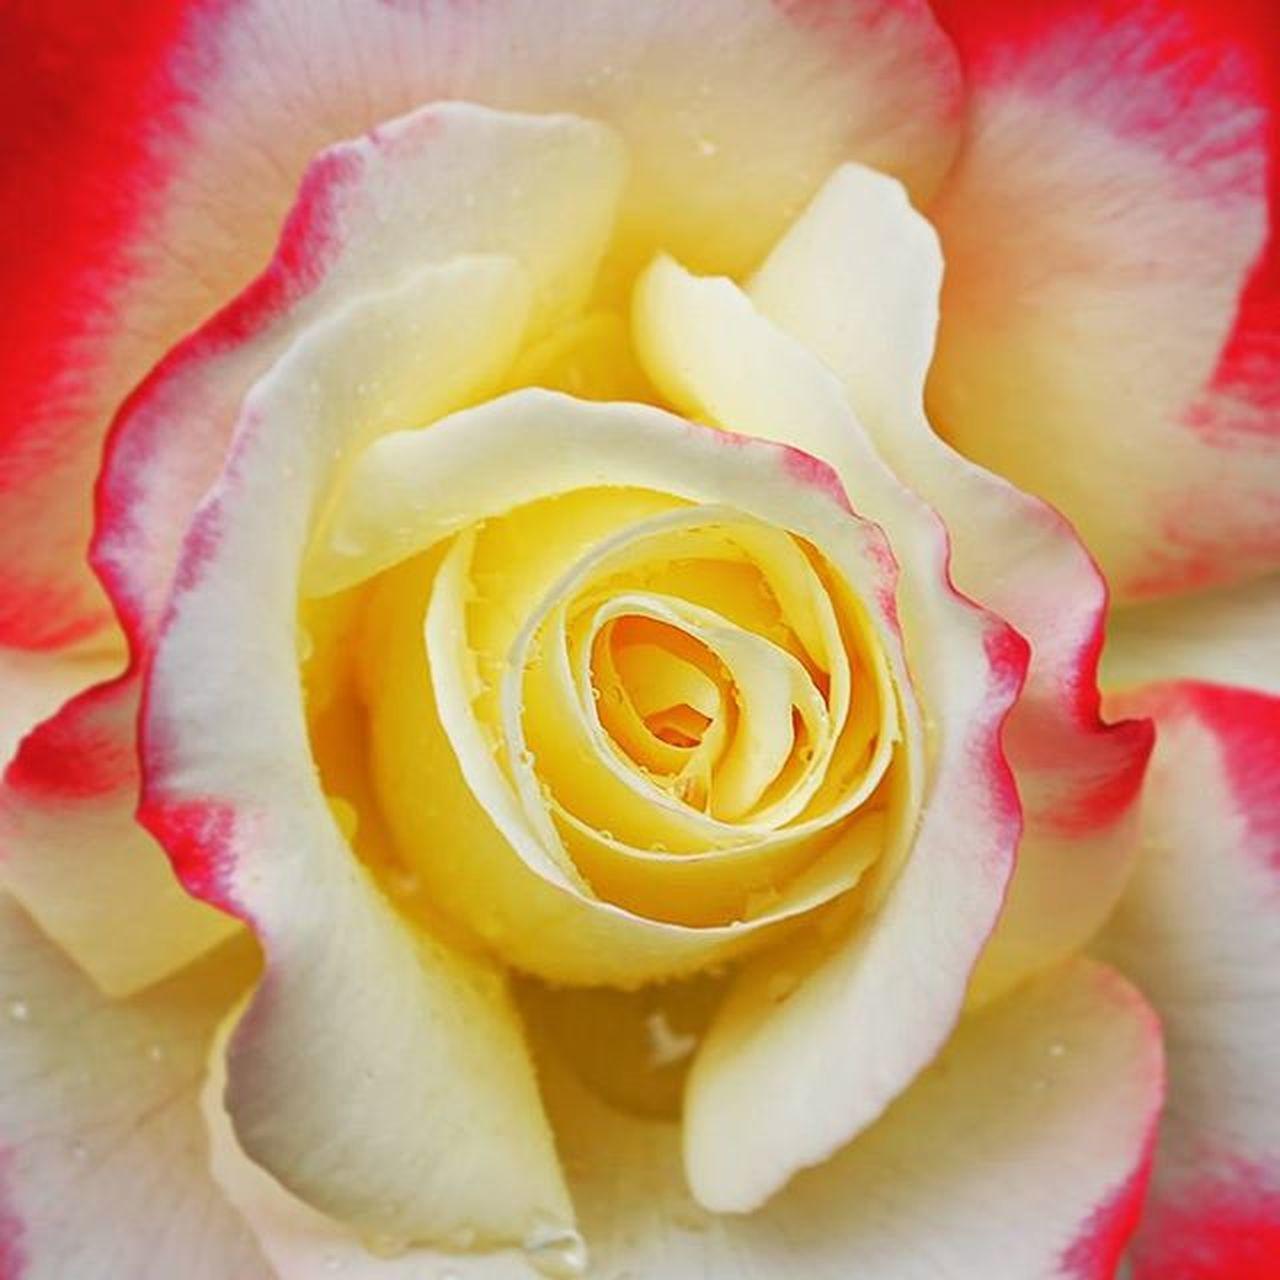 Rosé Doubledelight Nature Flower Petals Red Vibrant Macro Closeup Beautiful Beauty Dew Droplets Lead_me_to_oblivion Garden Gardening